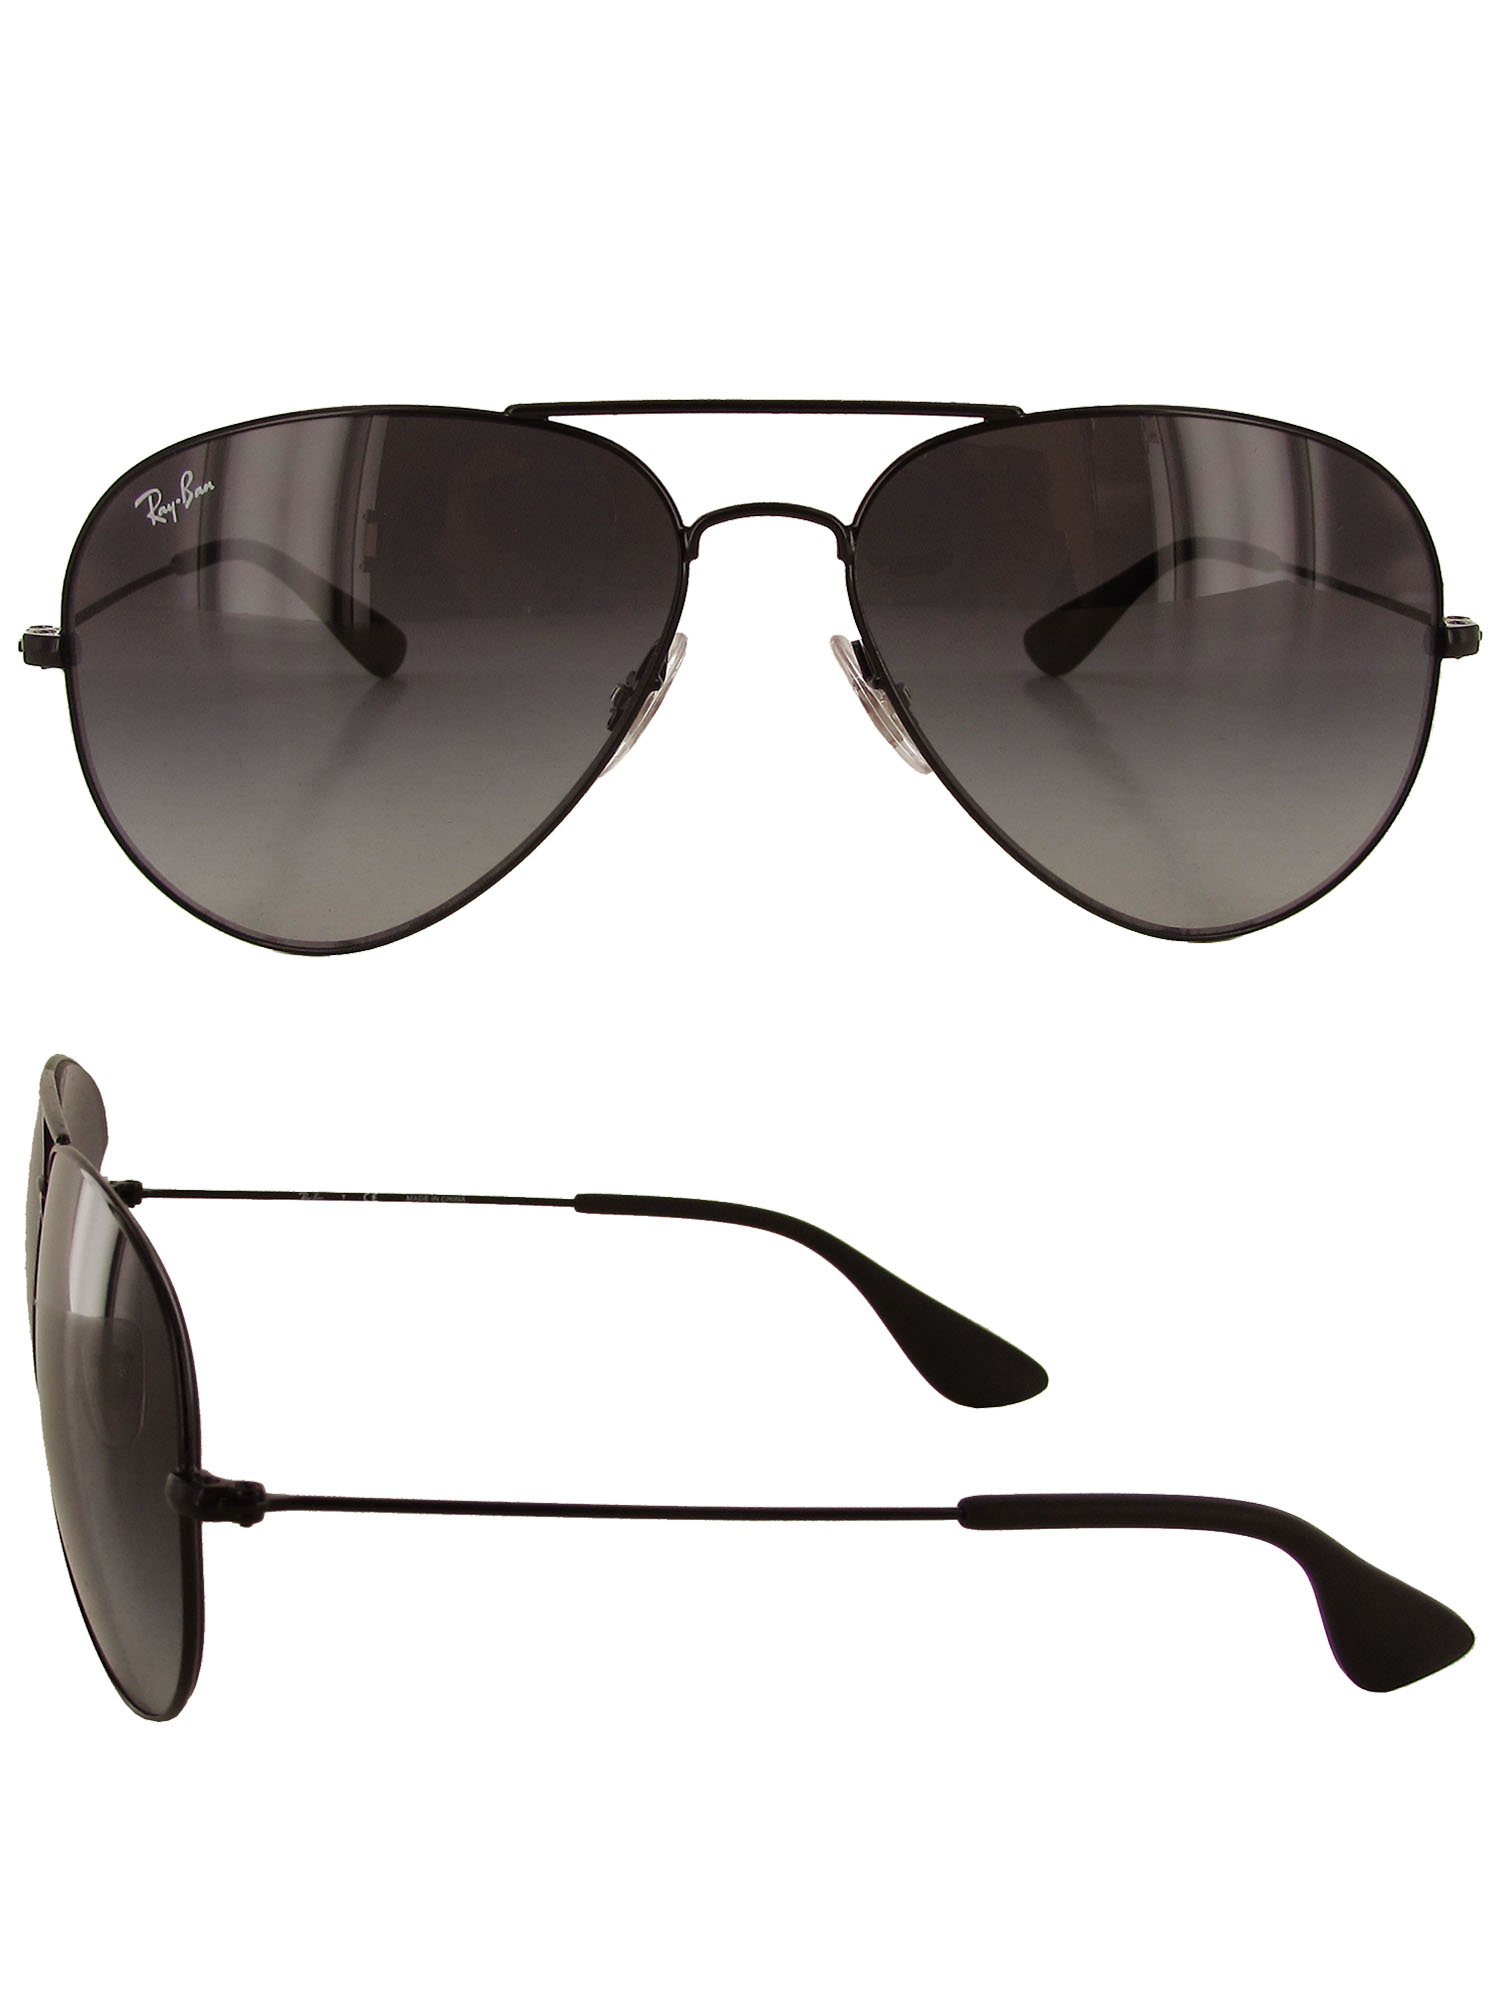 7288e95cd60b58 Ray-Ban Rb3558 002 8g Black Frame Grey Gradient 58mm Lens Sunglasses ...